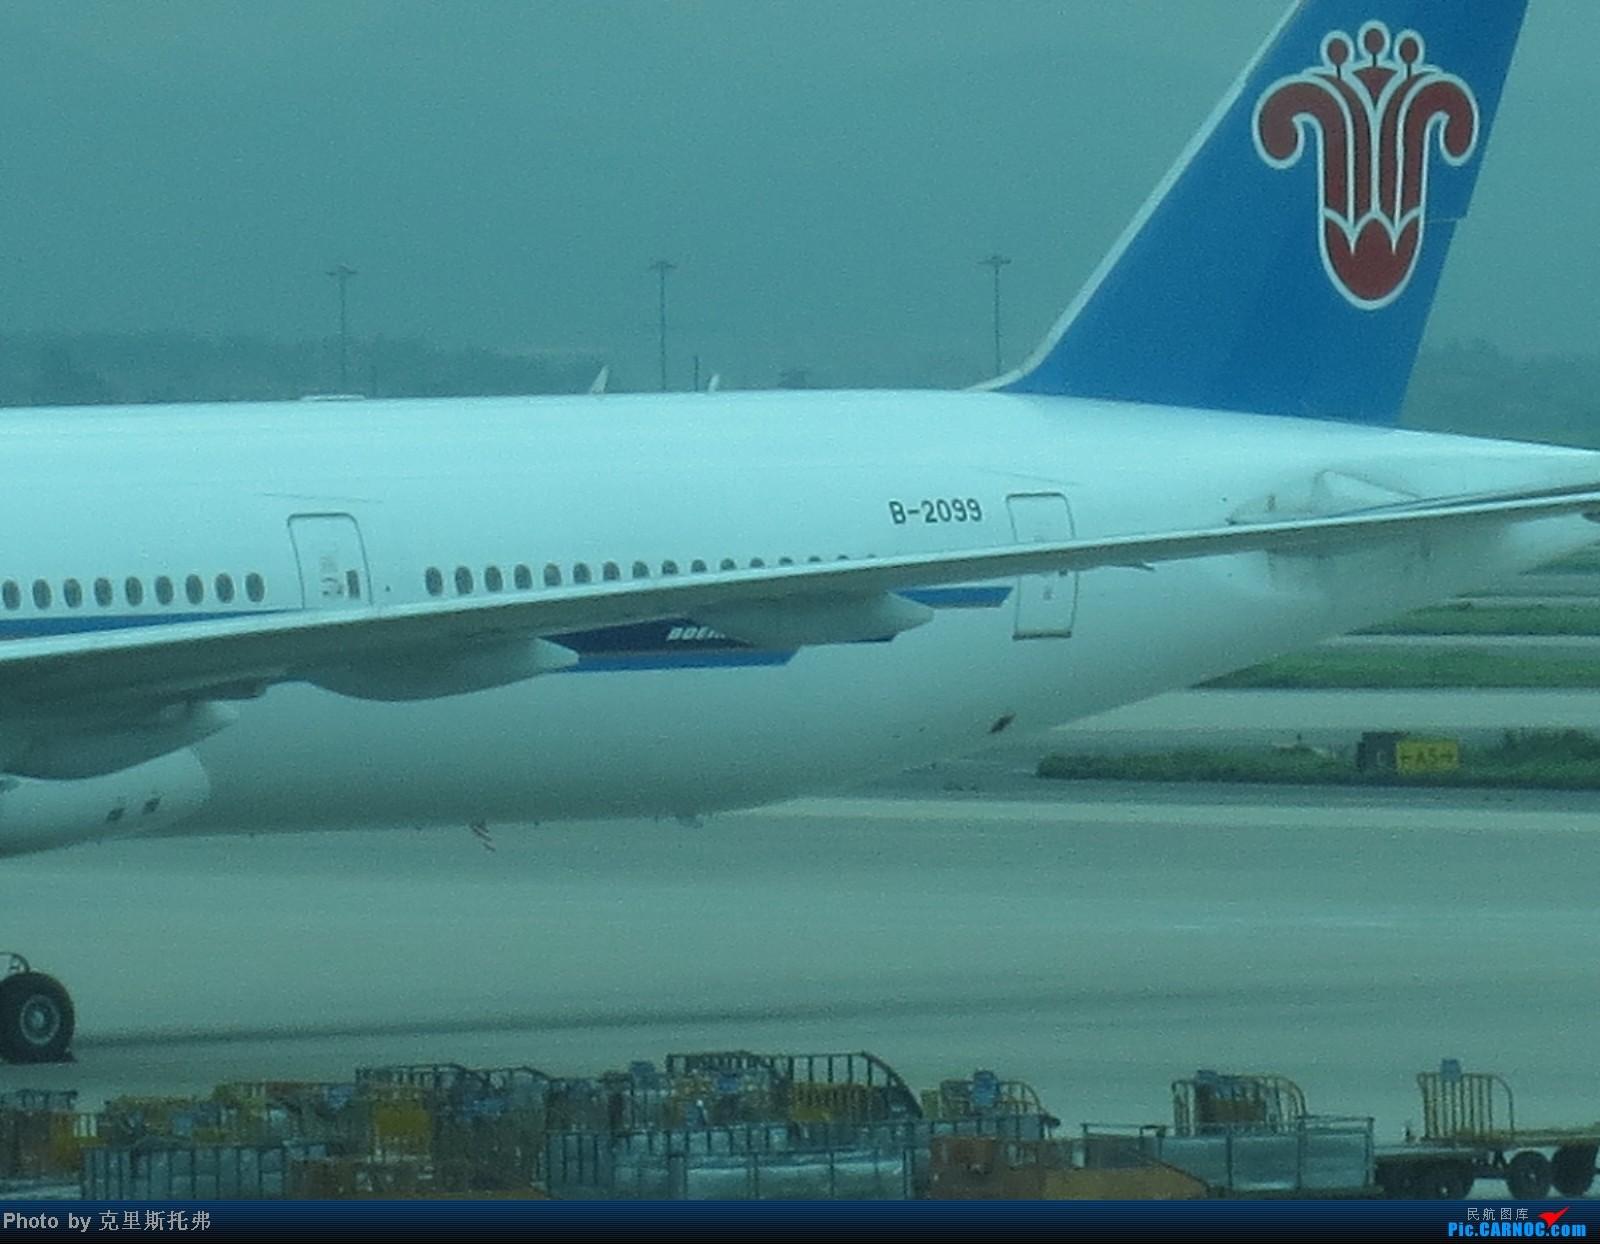 Re:[原创]【广州,你好!】八月齐鲁行 第一集 {初到齐鲁城} 不期而遇,鹏程行万里 相伴相惜,享飞行至美 BOEING 777-300 B-2099